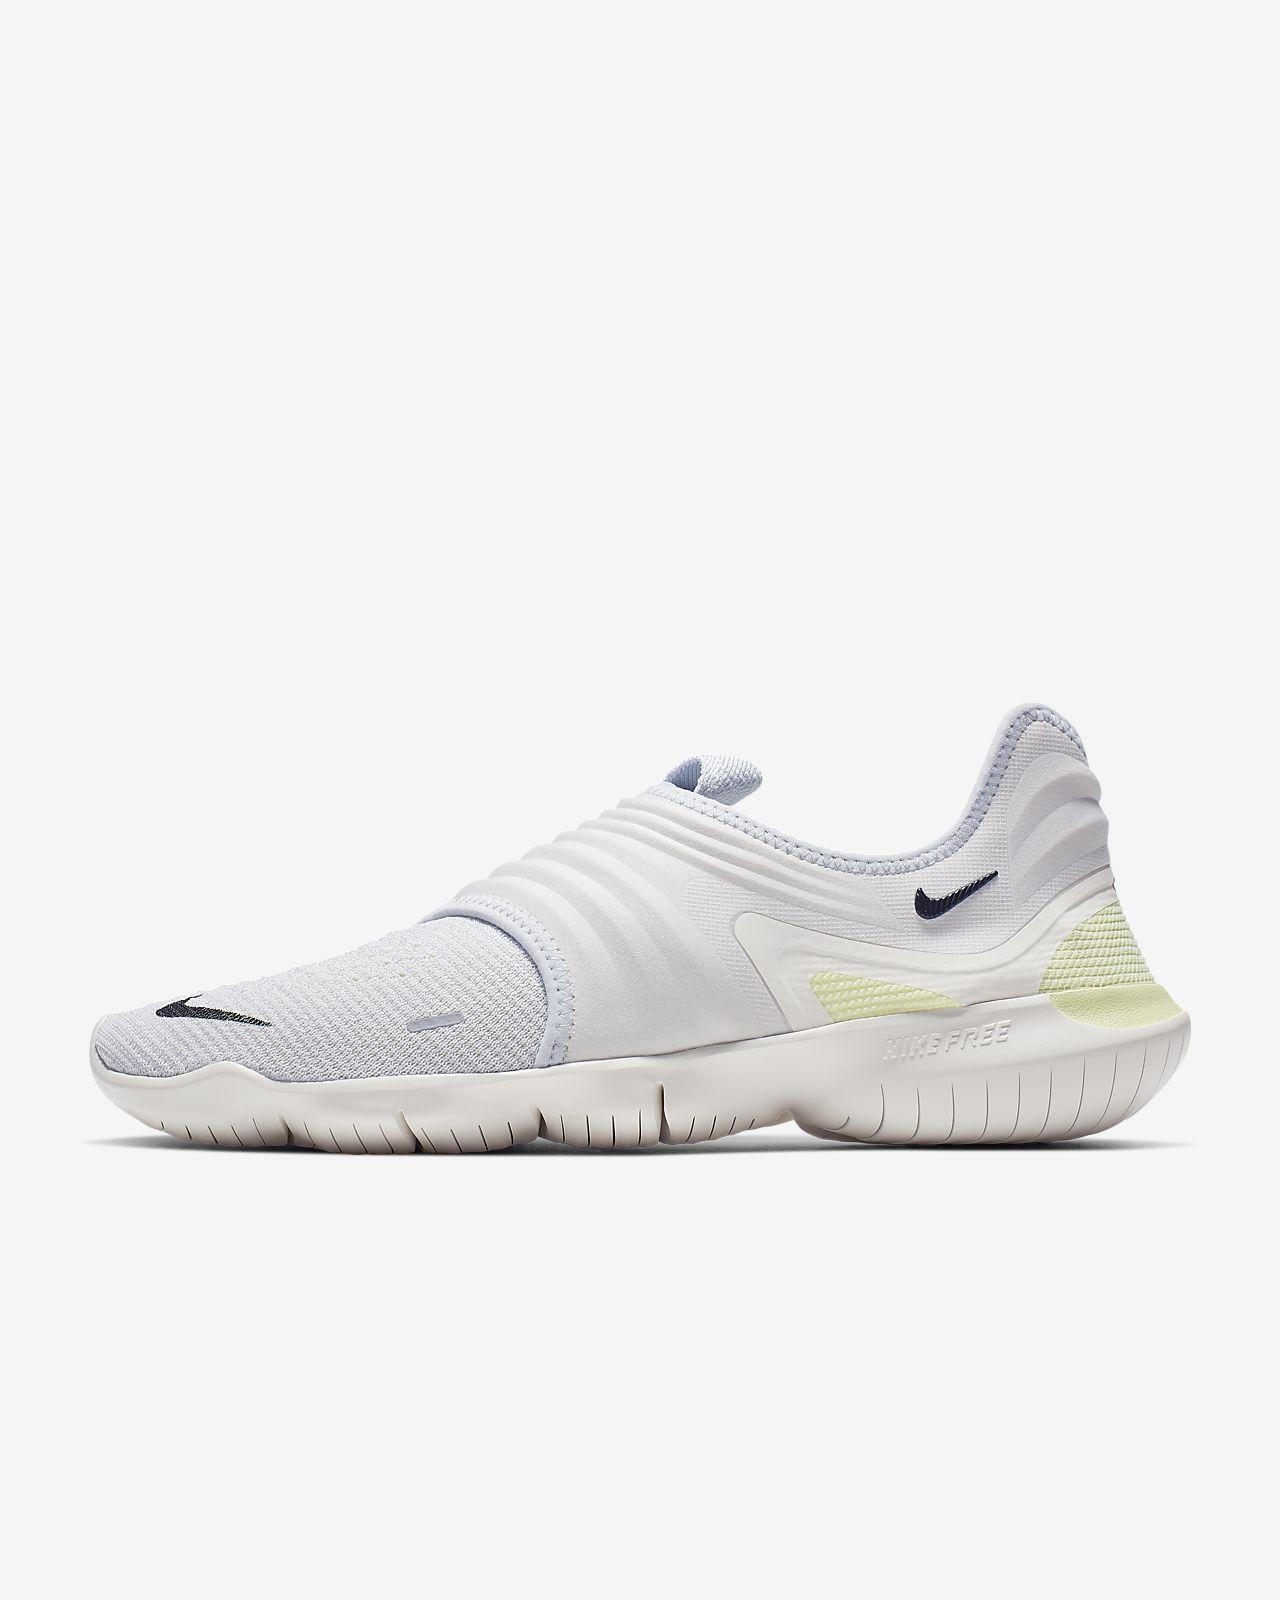 0be8c254058f9 Nike Free RN Flyknit 3.0 Zapatillas de running - Hombre. Nike.com ES